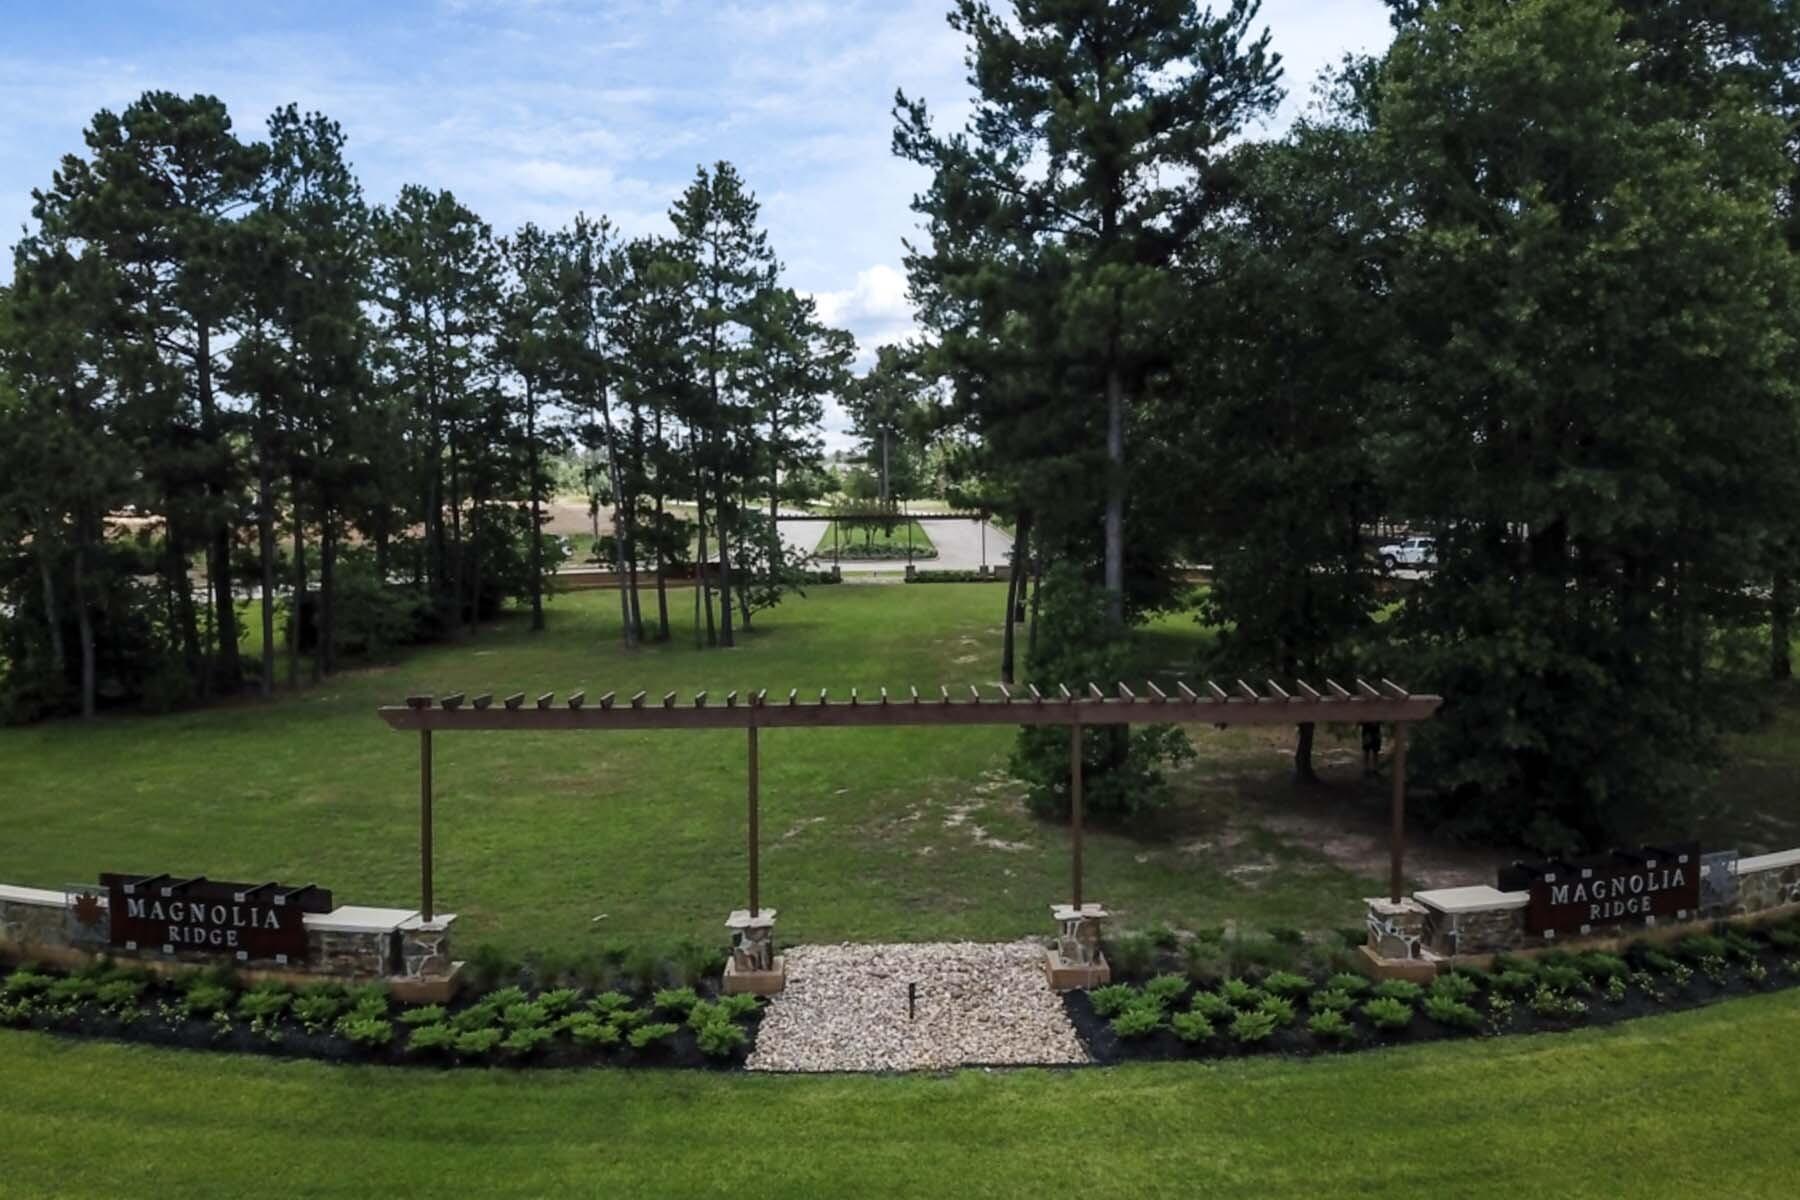 Magnolia Ridge Green Space